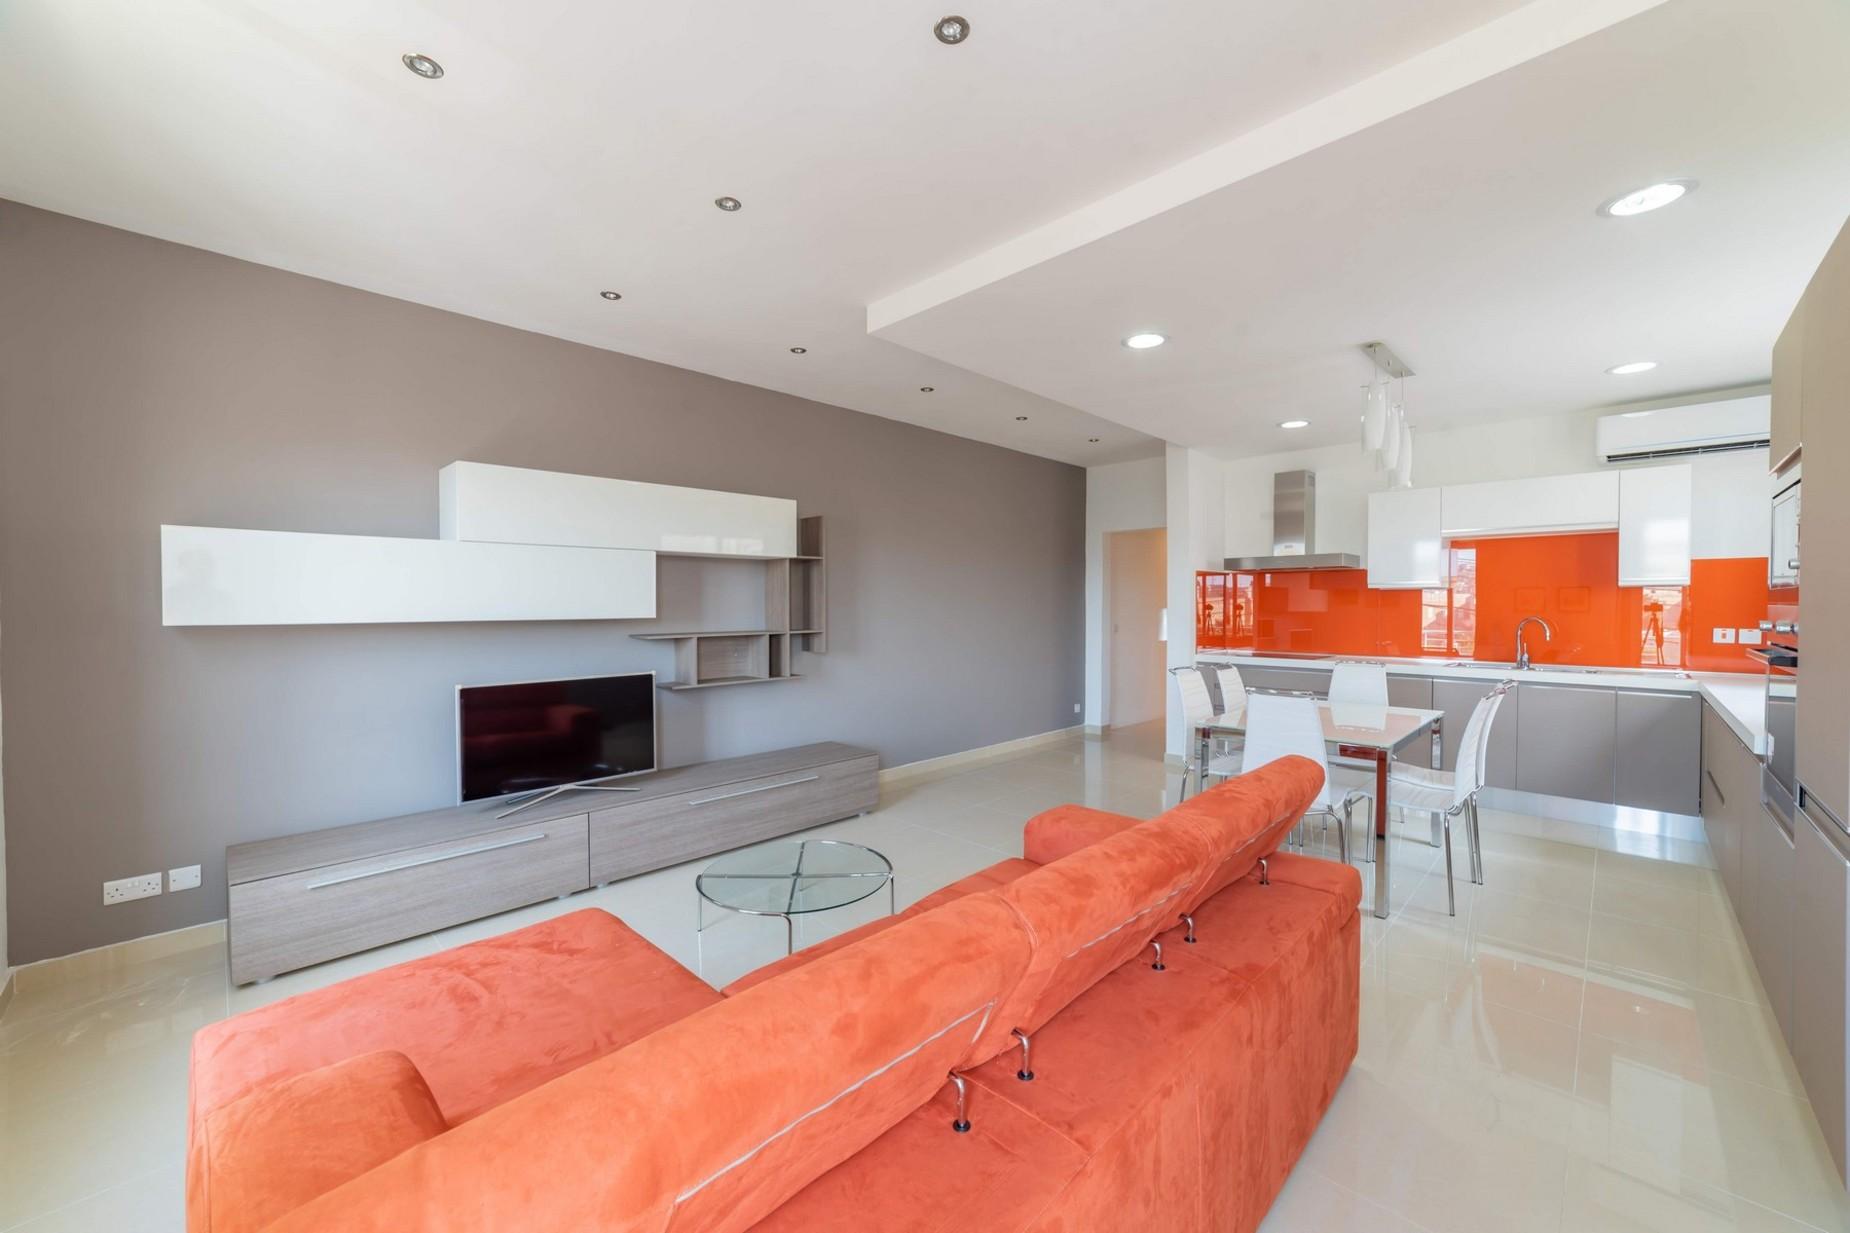 3 bed Apartment For Rent in Balzan, Balzan - thumb 3